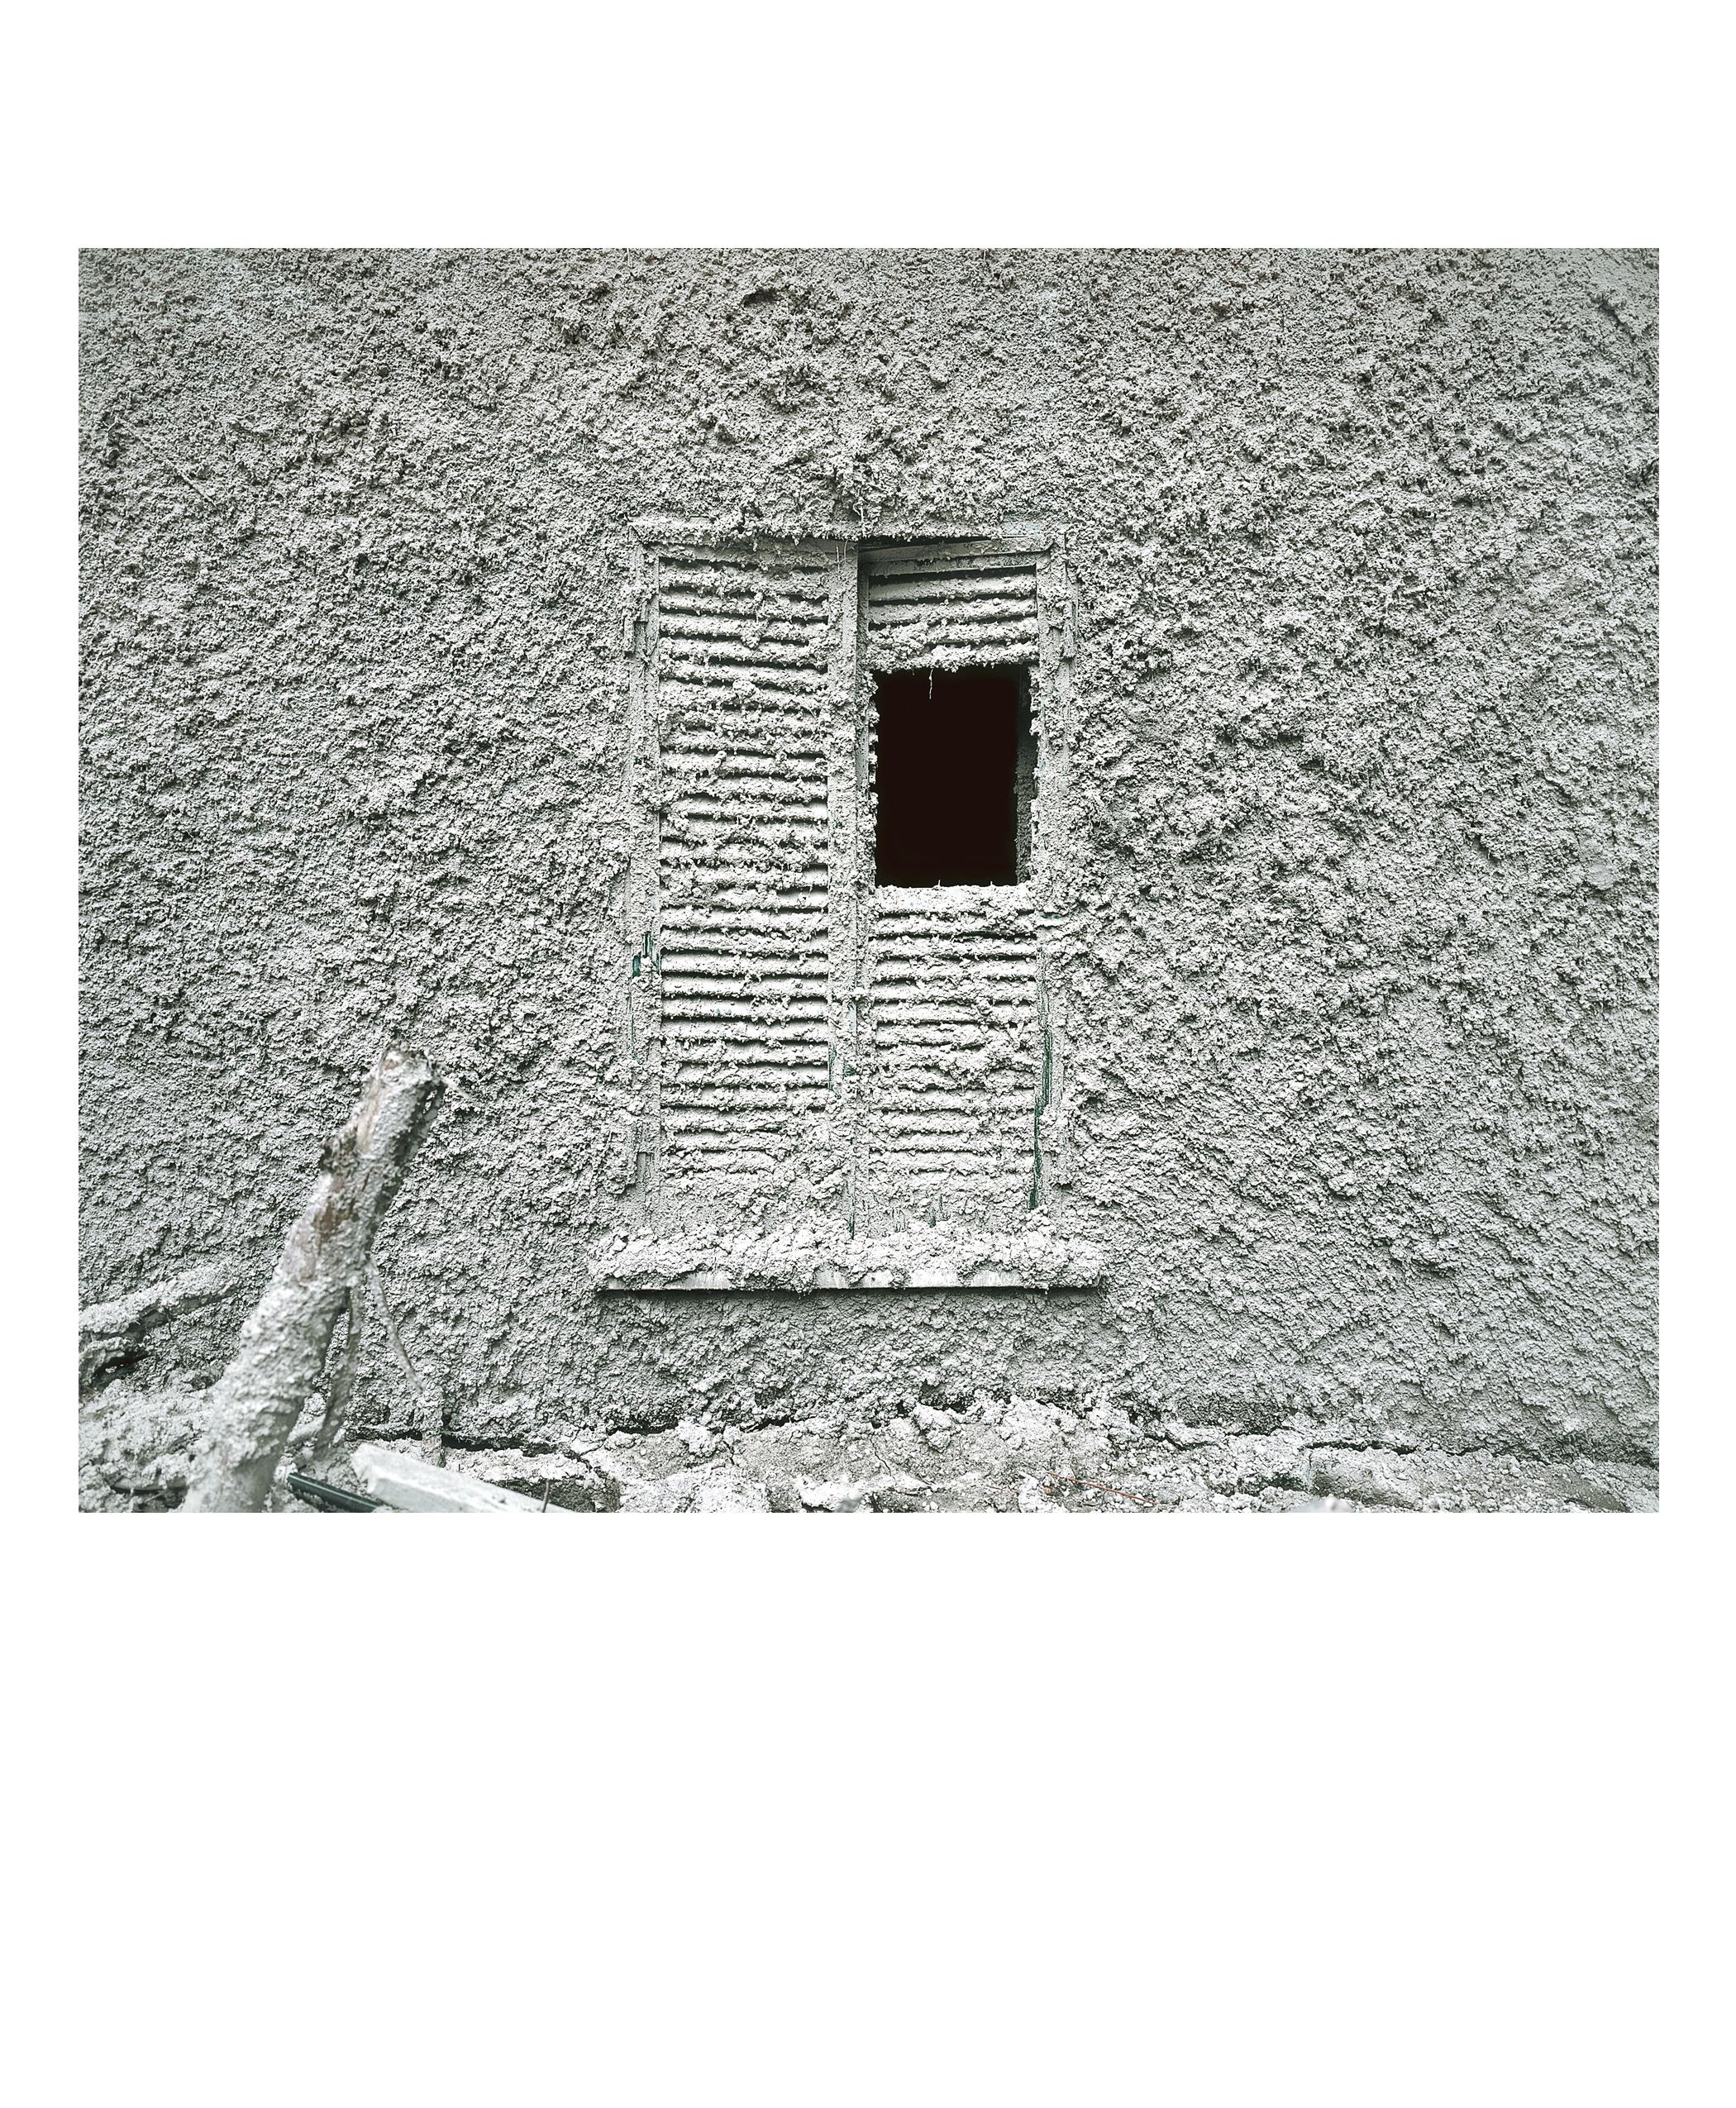 Window (After Mudslide) Ischia, Campania